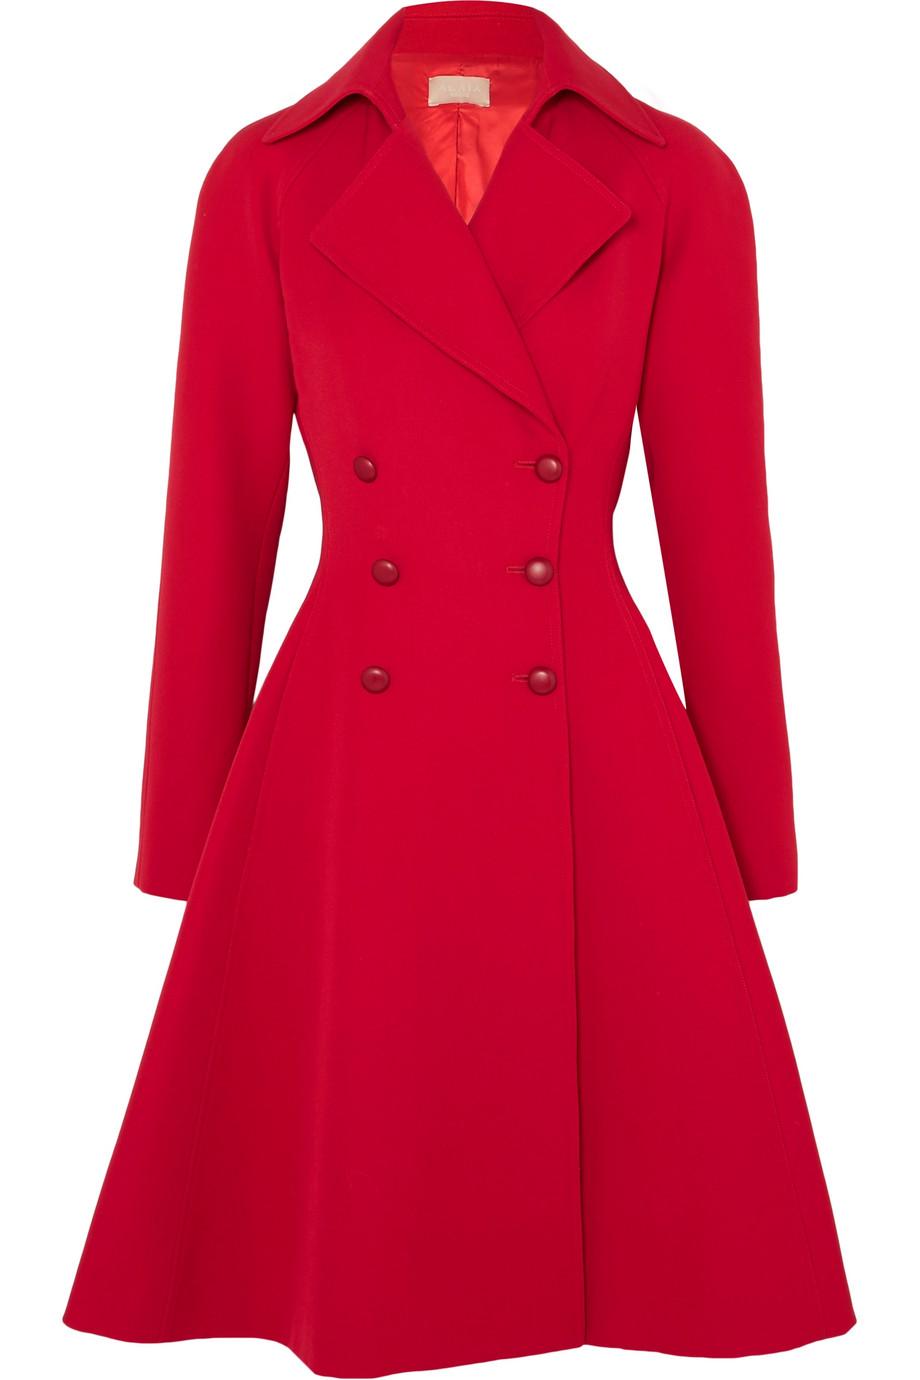 Alaïa Double-Breasted Wool-Gabardine Coat in Red.jpg